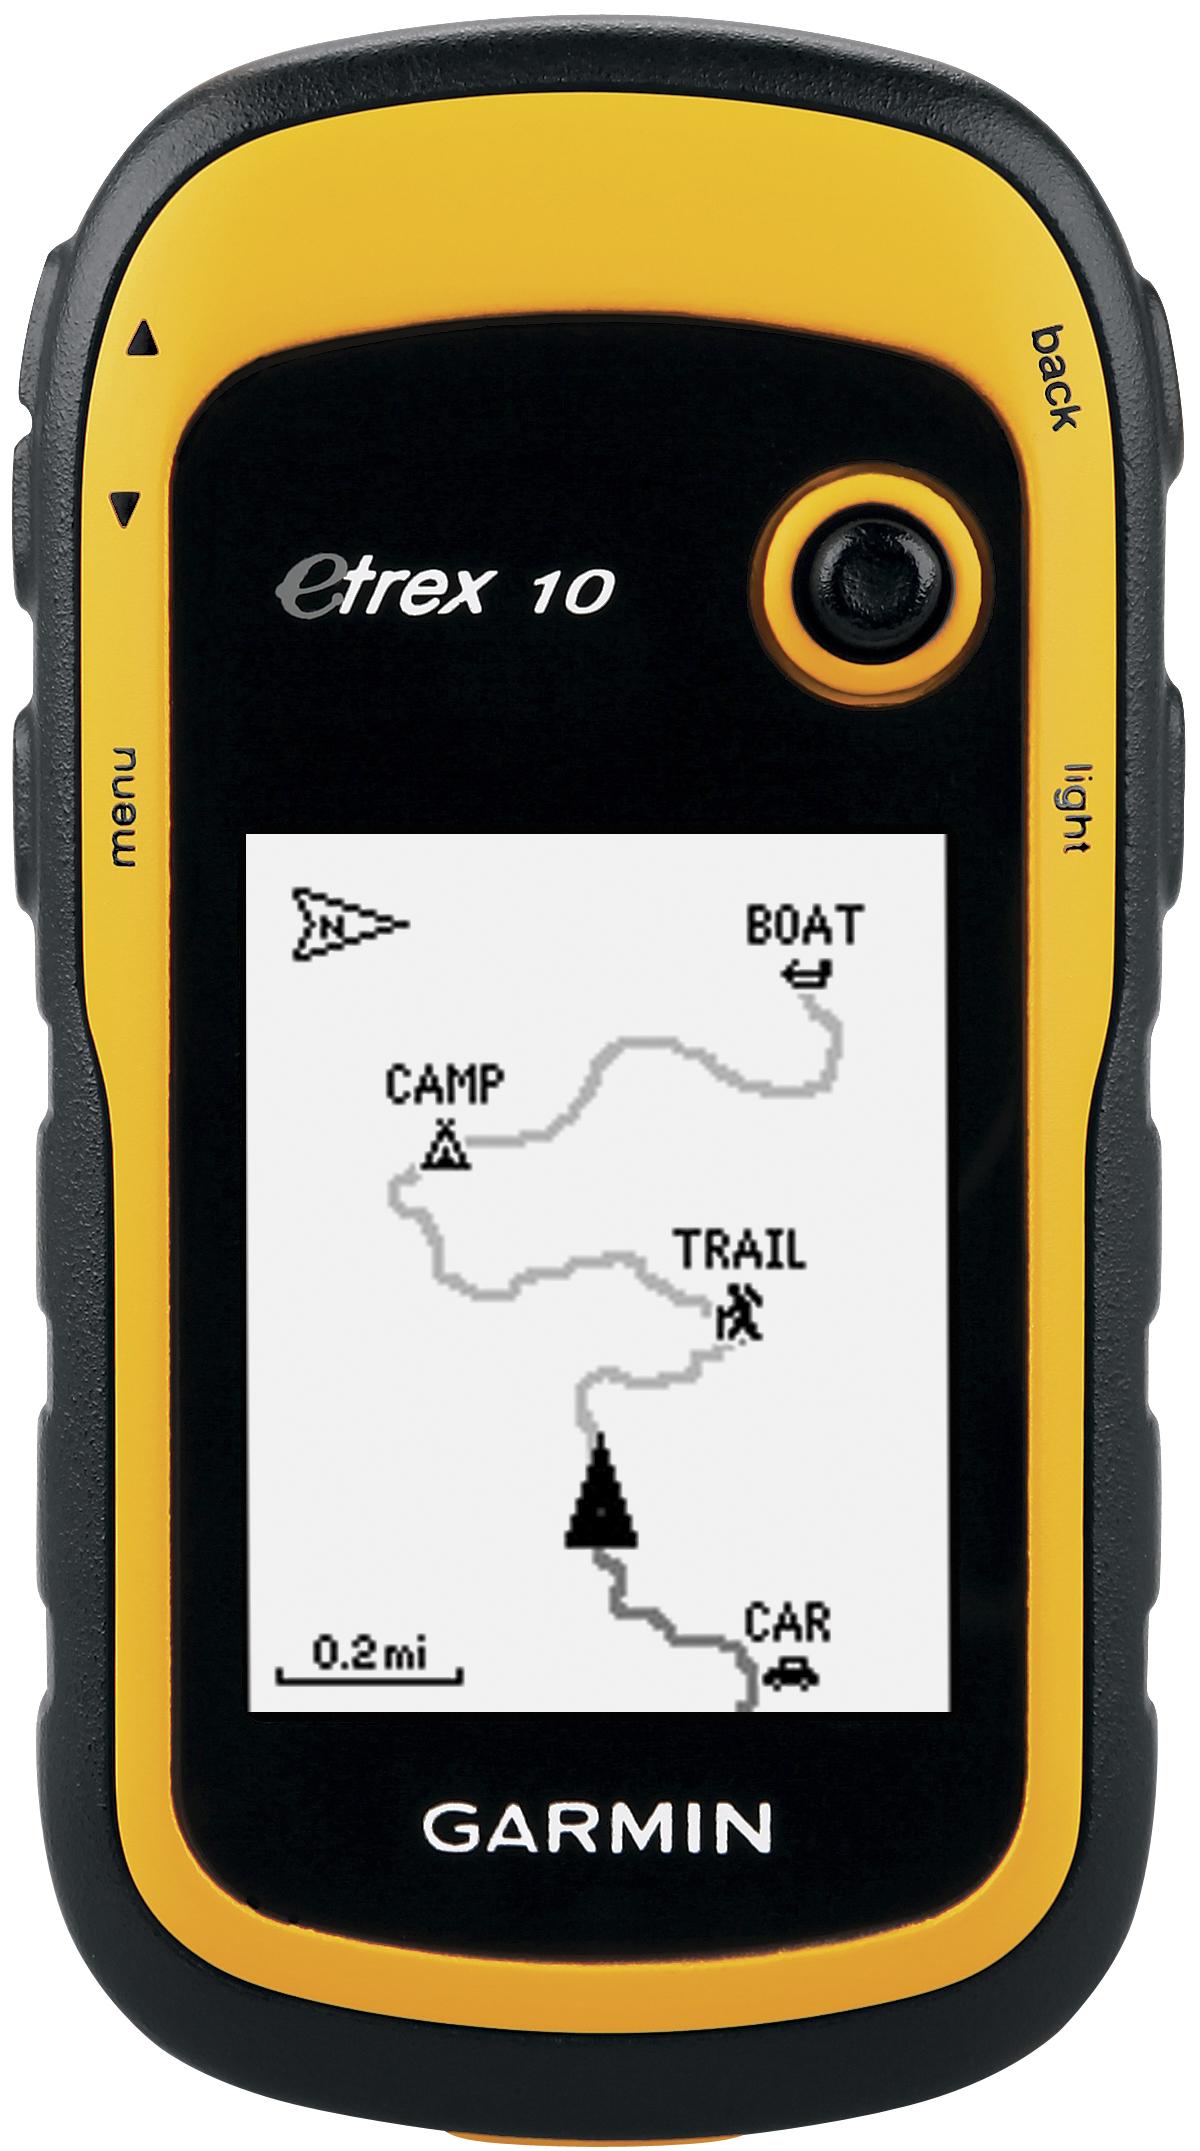 Garmin eTrex 10 GPS | MEC